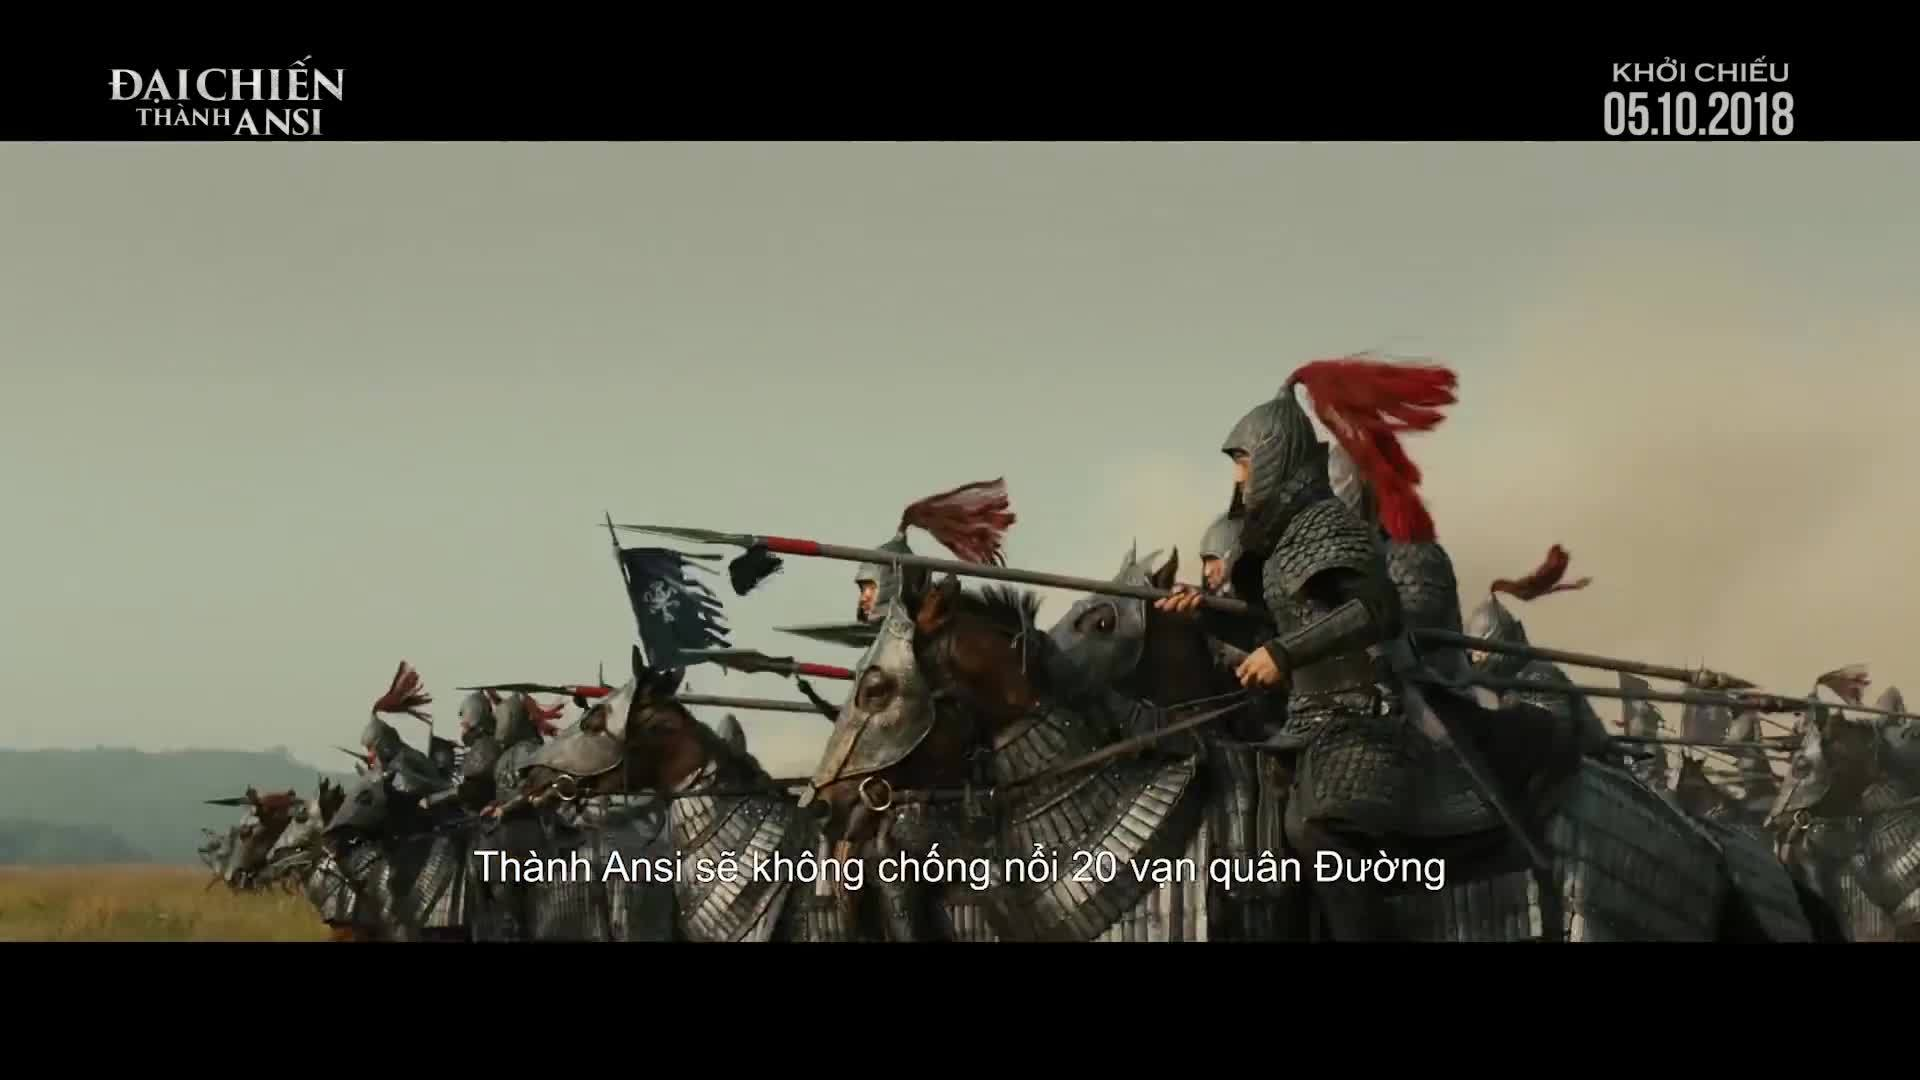 Trailer The Great Battle (Đại chiến thành Ansi)